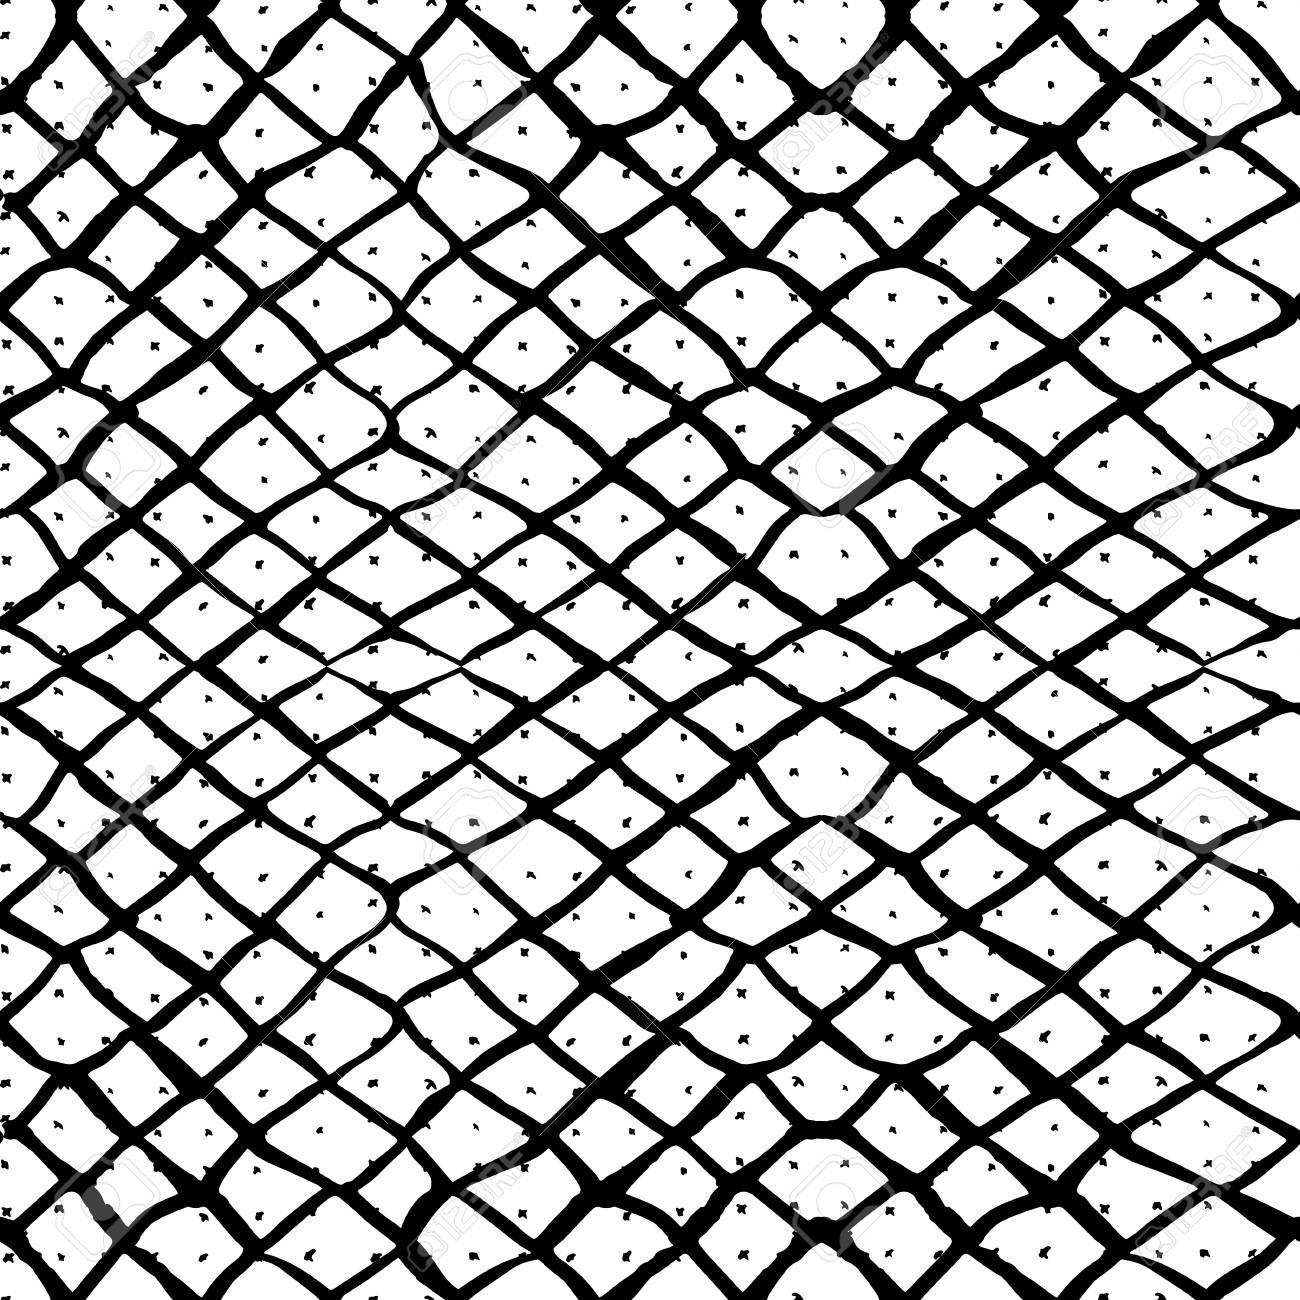 tie dye pettern japanese print batik texture vector seamless Purple Dye tie dye pettern japanese print batik texture vector seamless motif indonesian design